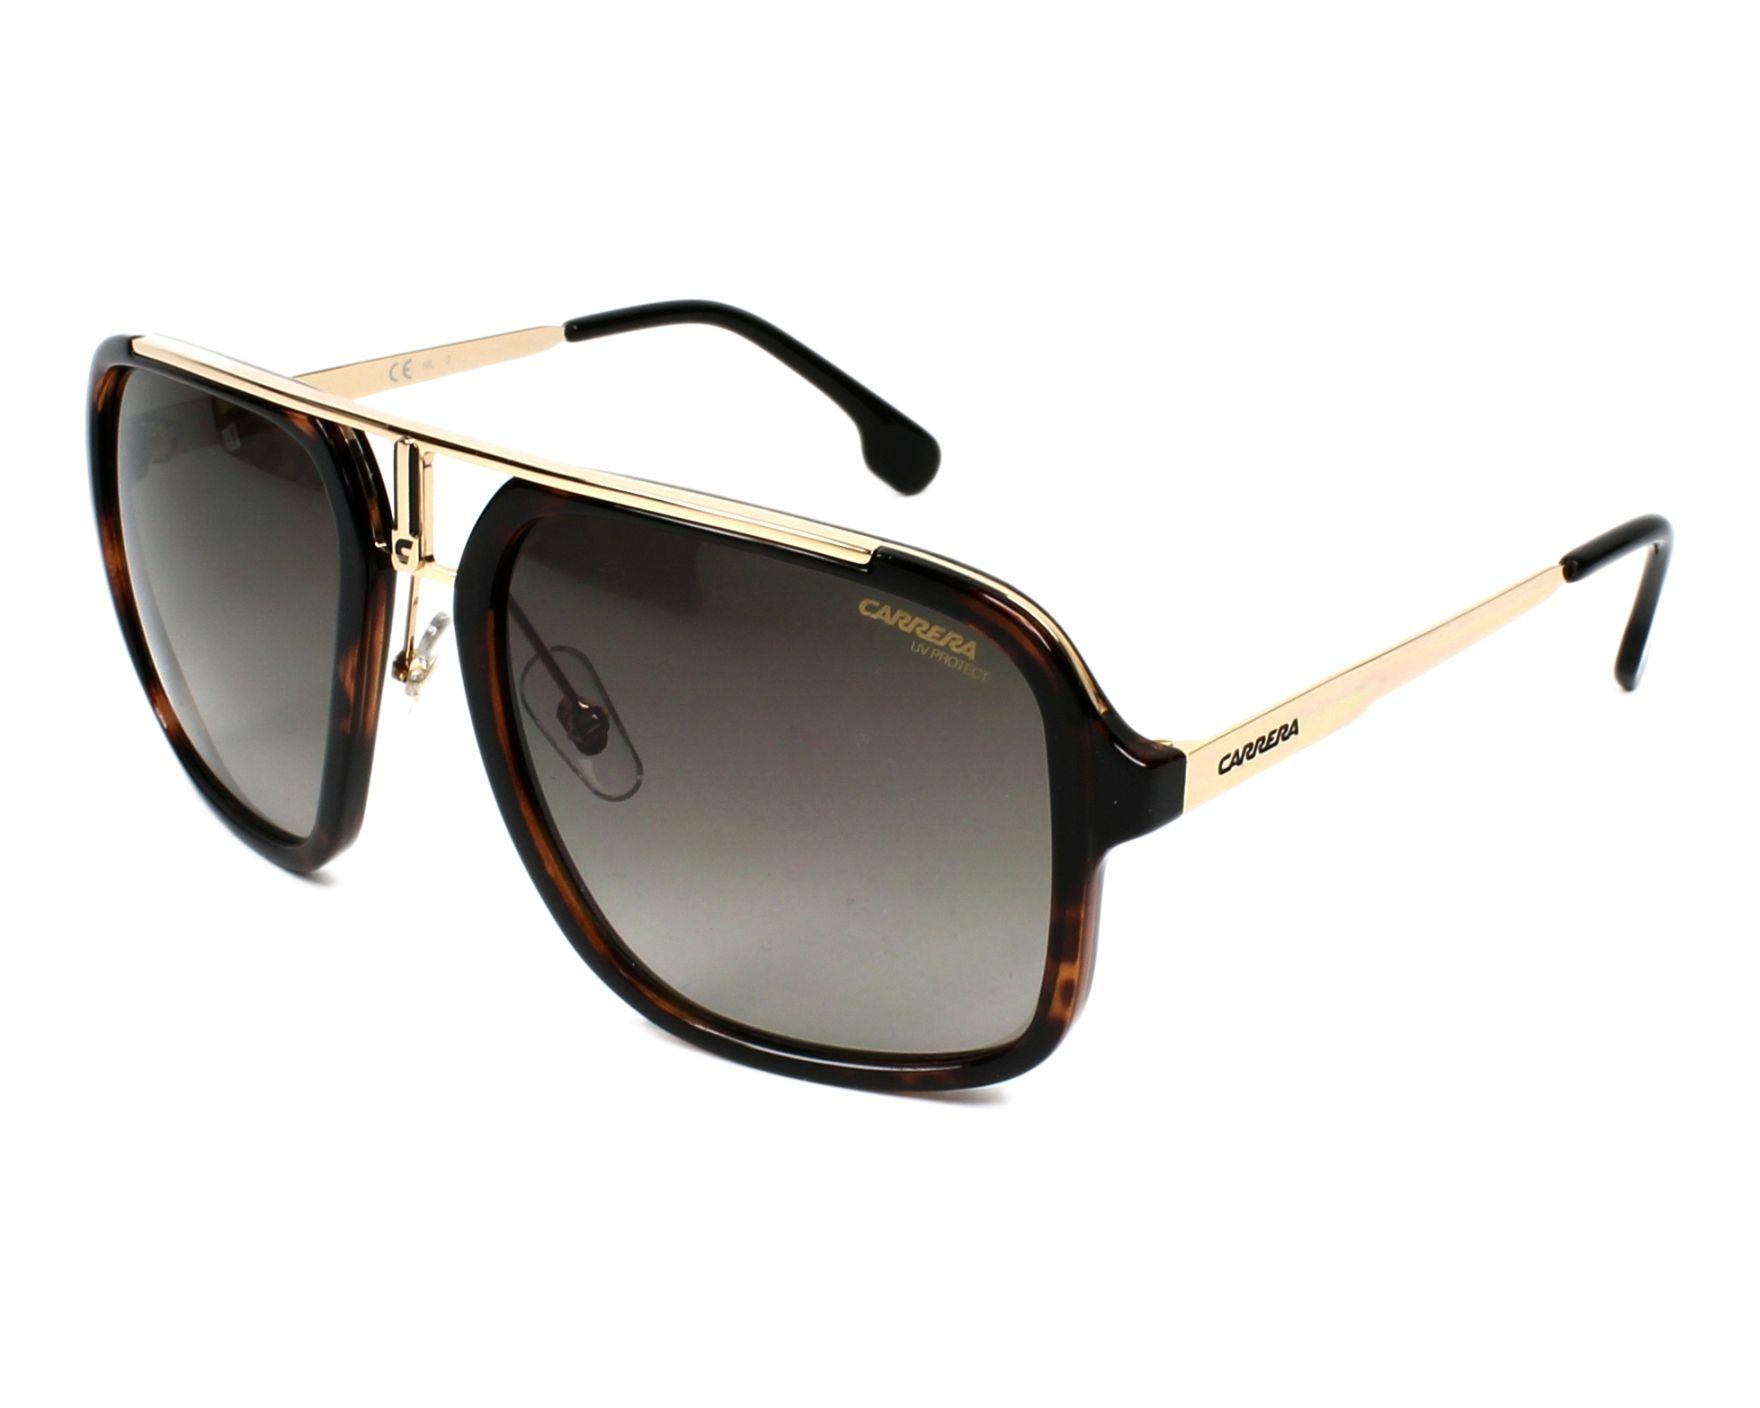 039452de93 Sunglasses Carrera 1004-S 2IK/HA 57-20 Havana Gold profile view